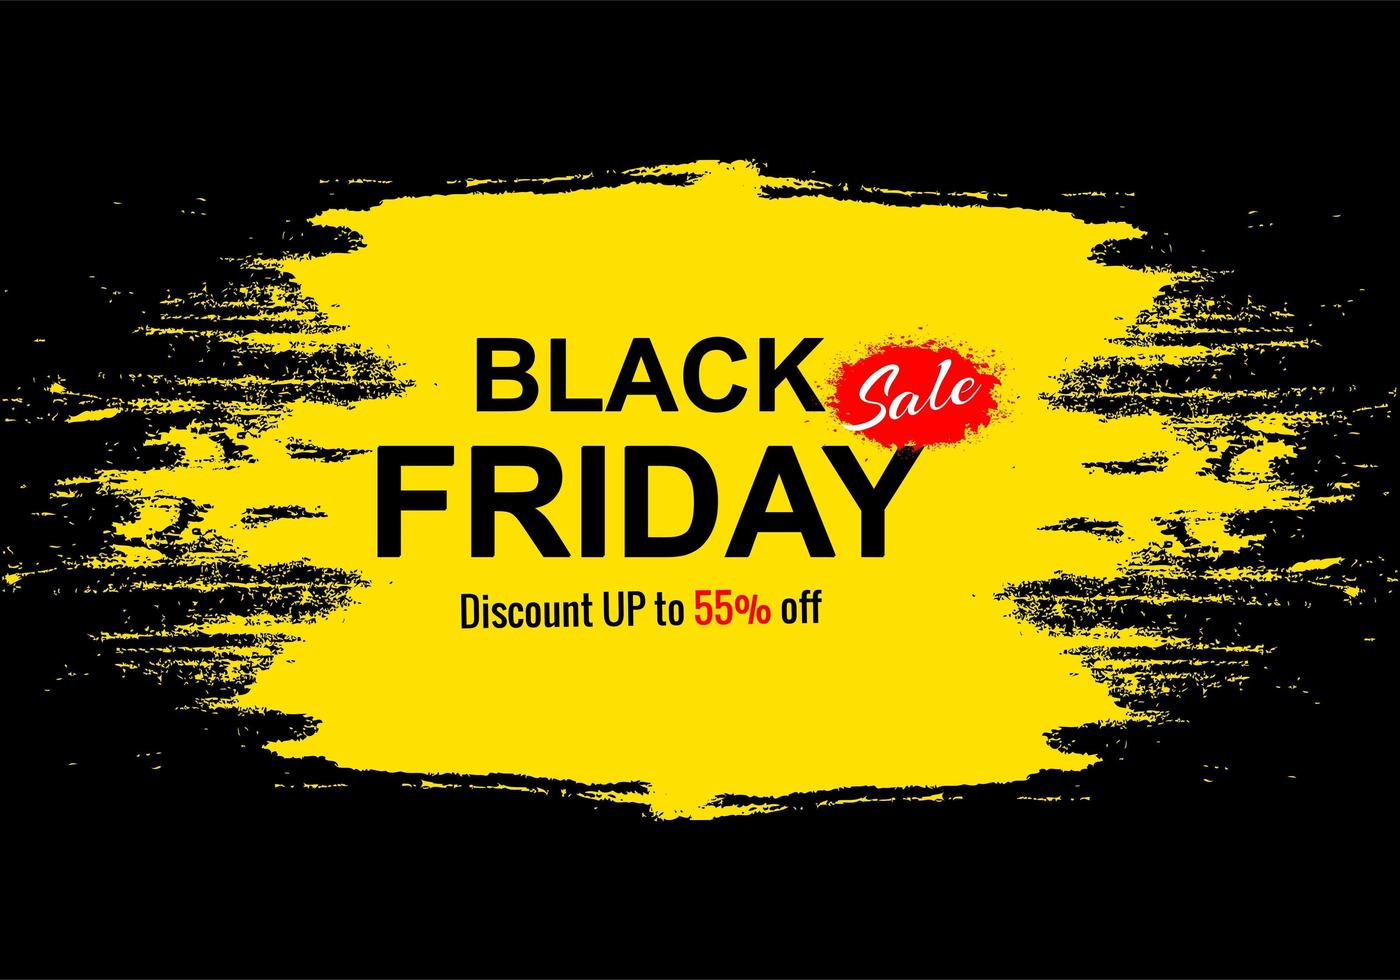 venda de feriado de sexta-feira negra para fundo de banner grunge vetor